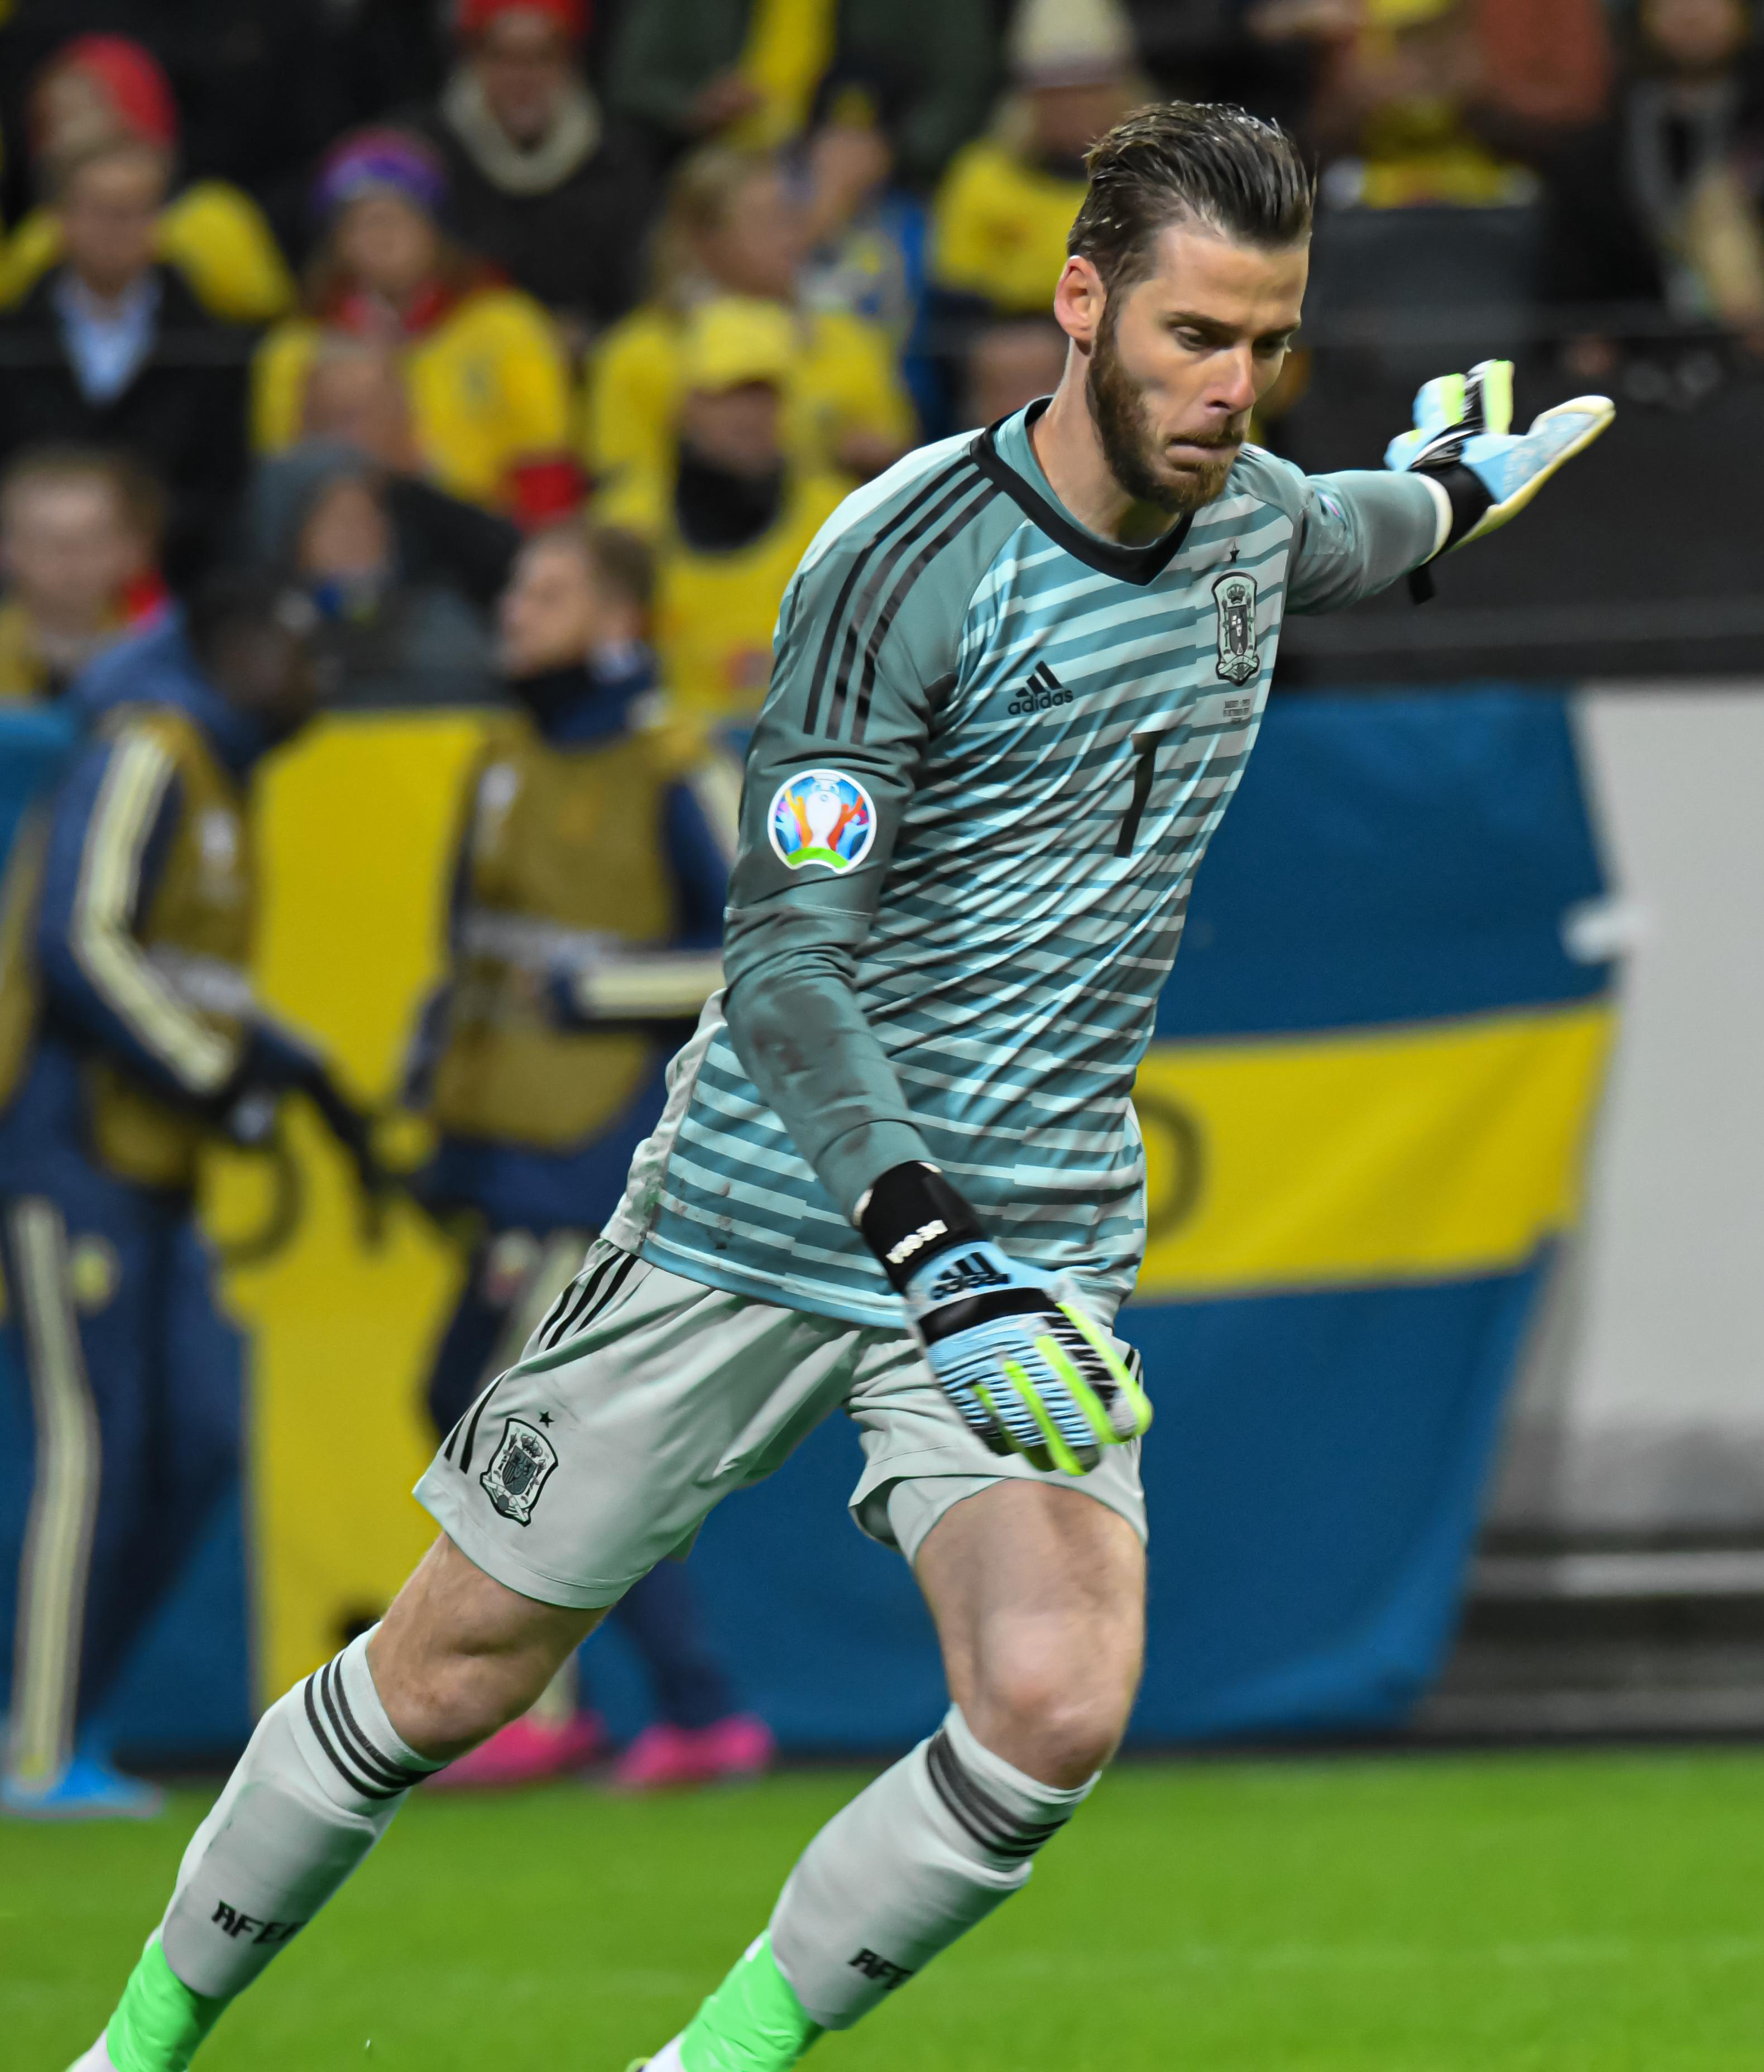 File:UEFA EURO qualifiers Sweden vs Spain 20191015 David de Gea 4.jpg